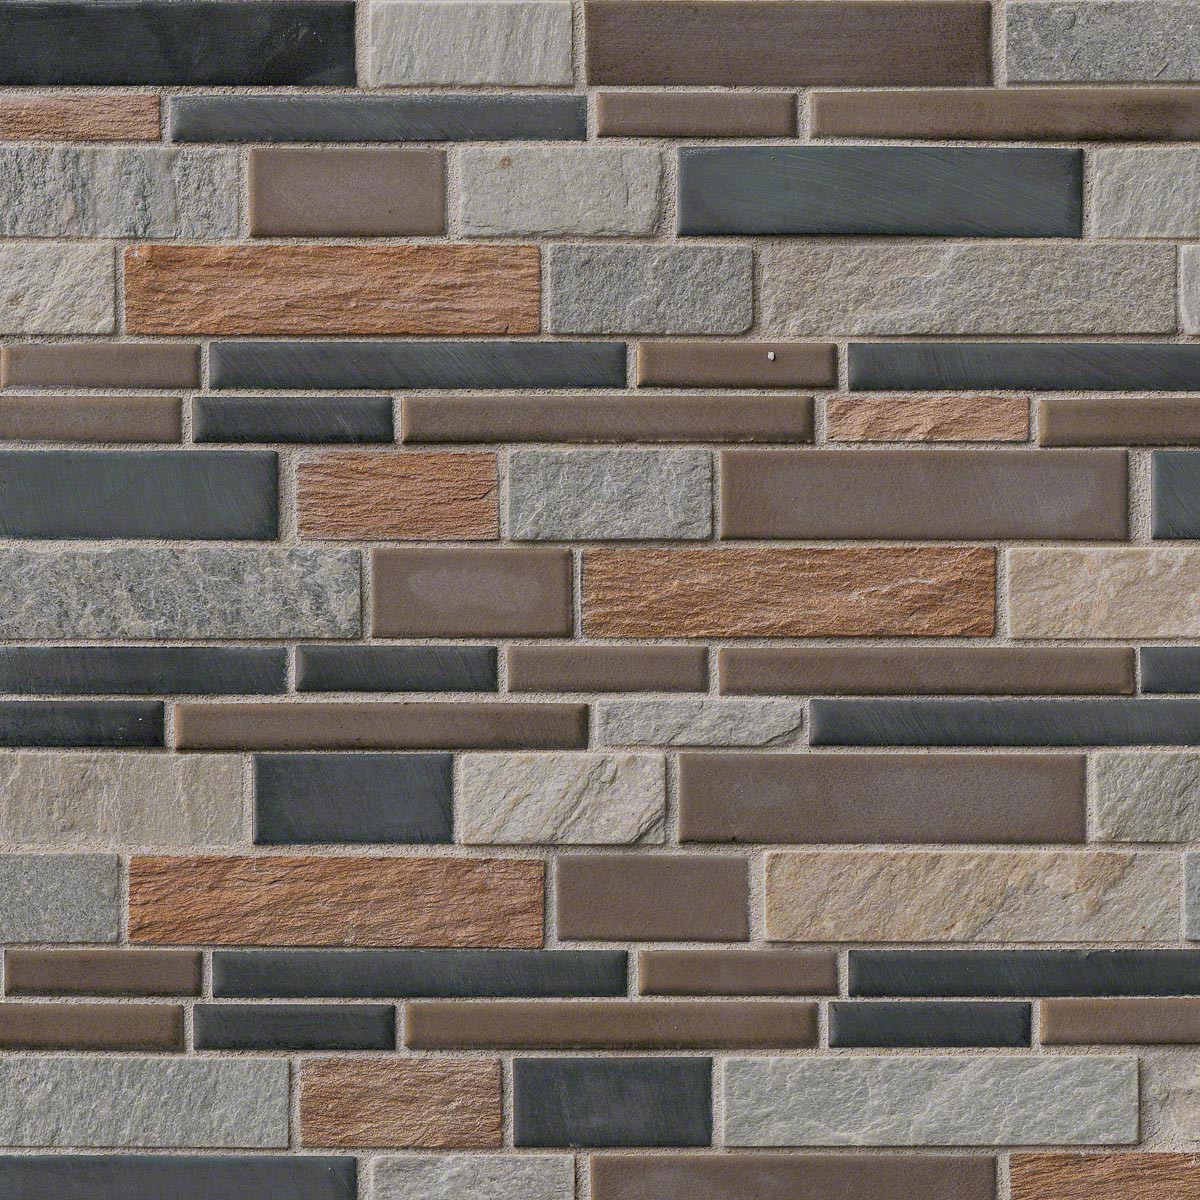 Cobrello Interlocking Patterned Mosaic On 12x12 Sheet